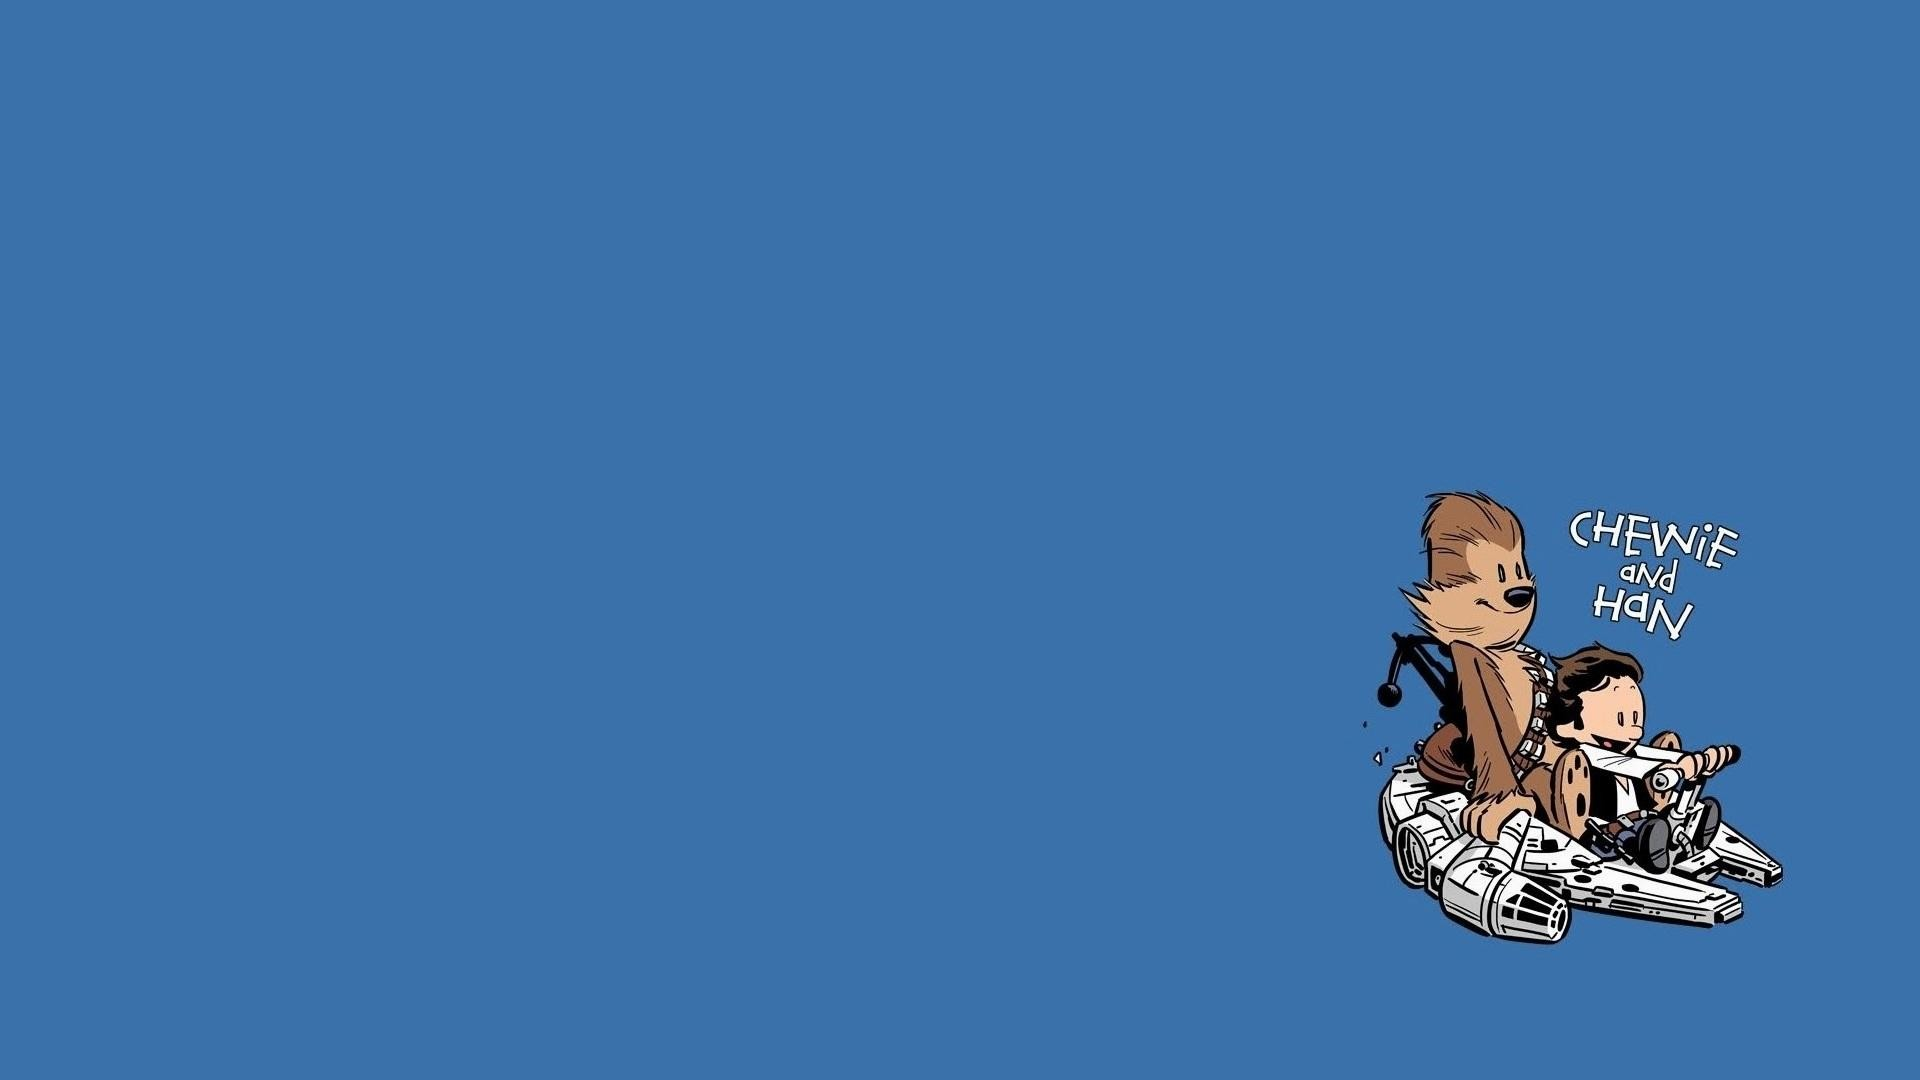 Wars-1920×1080-Star-Wars-Minimalistic-Calvin-And-Hobbes-